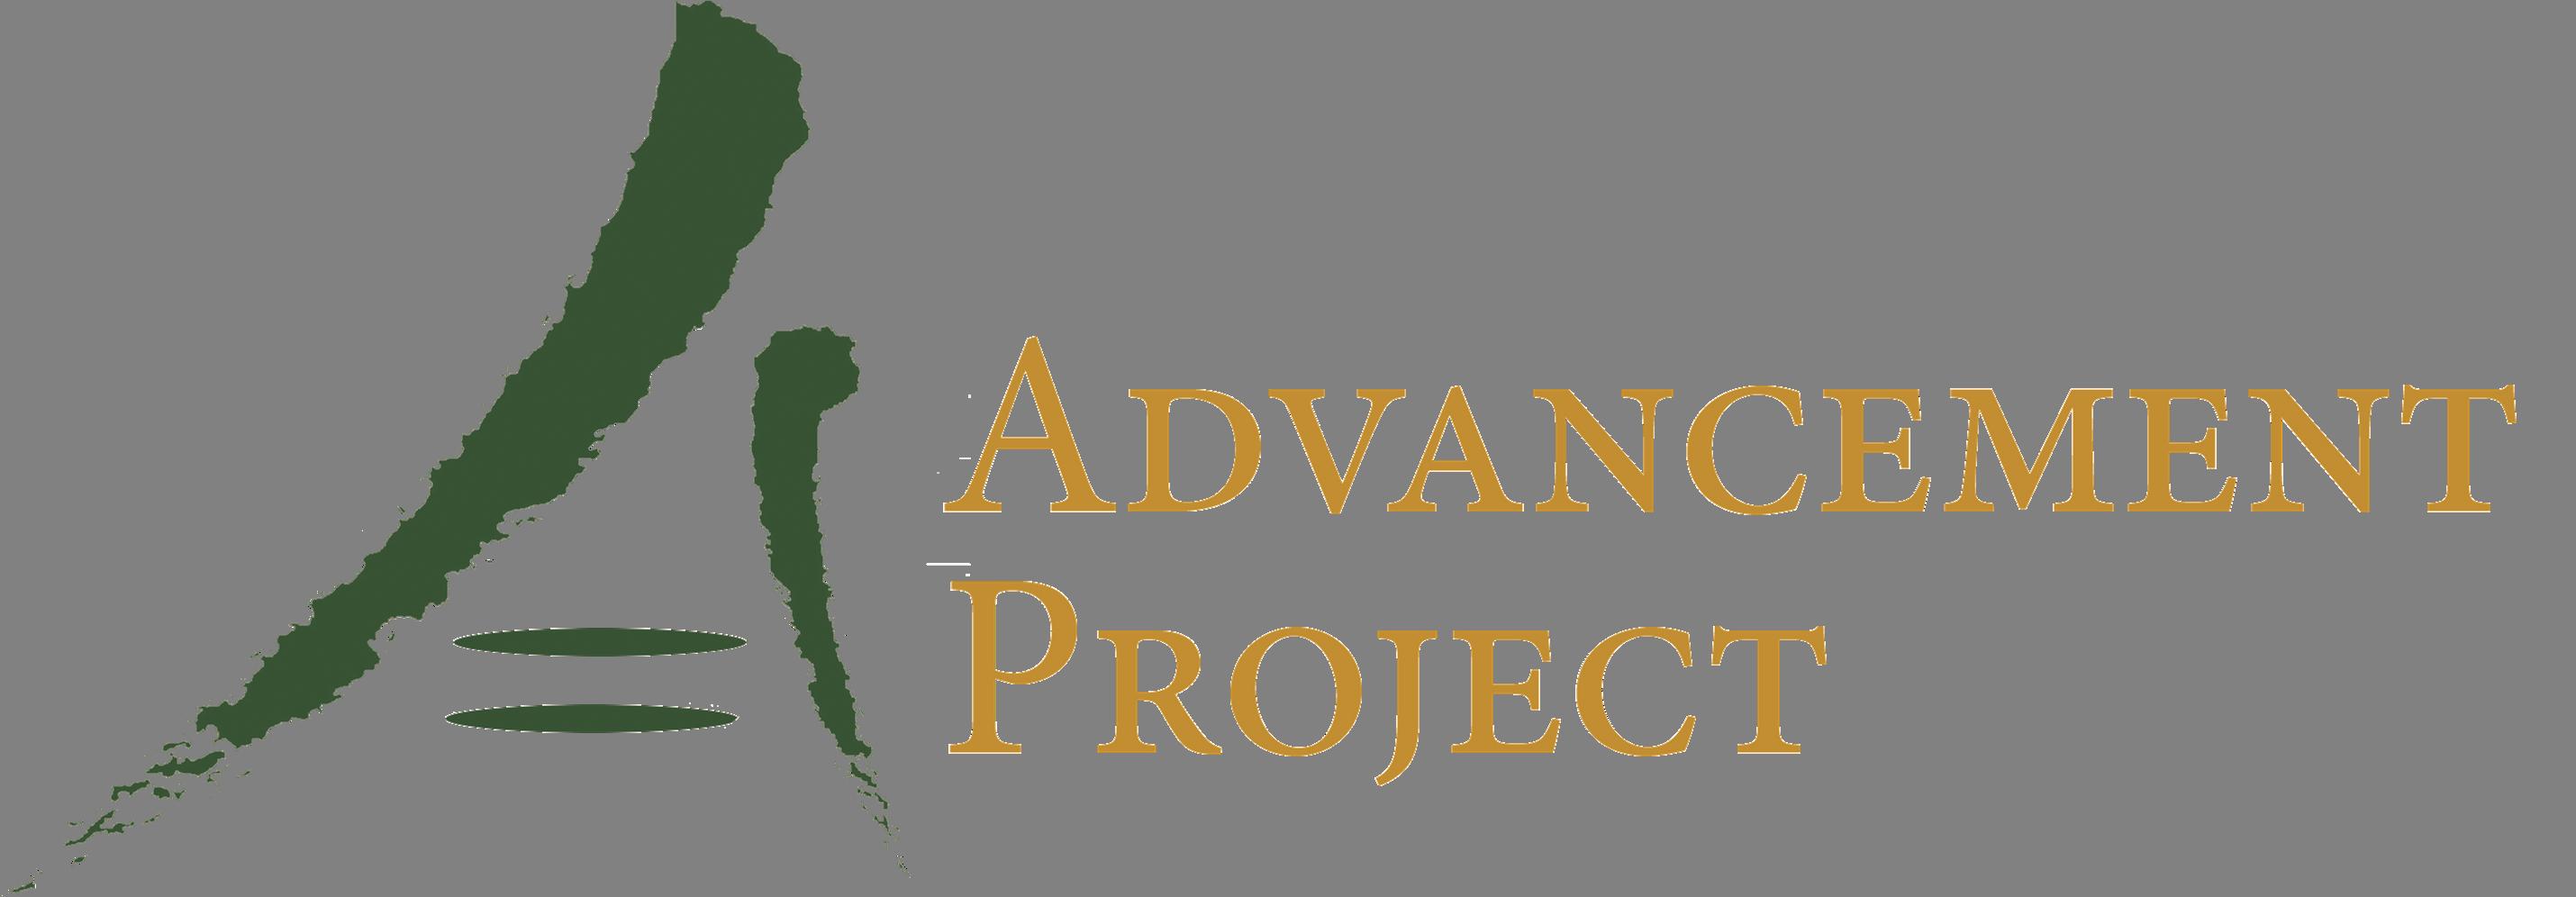 AdvancementProject.png